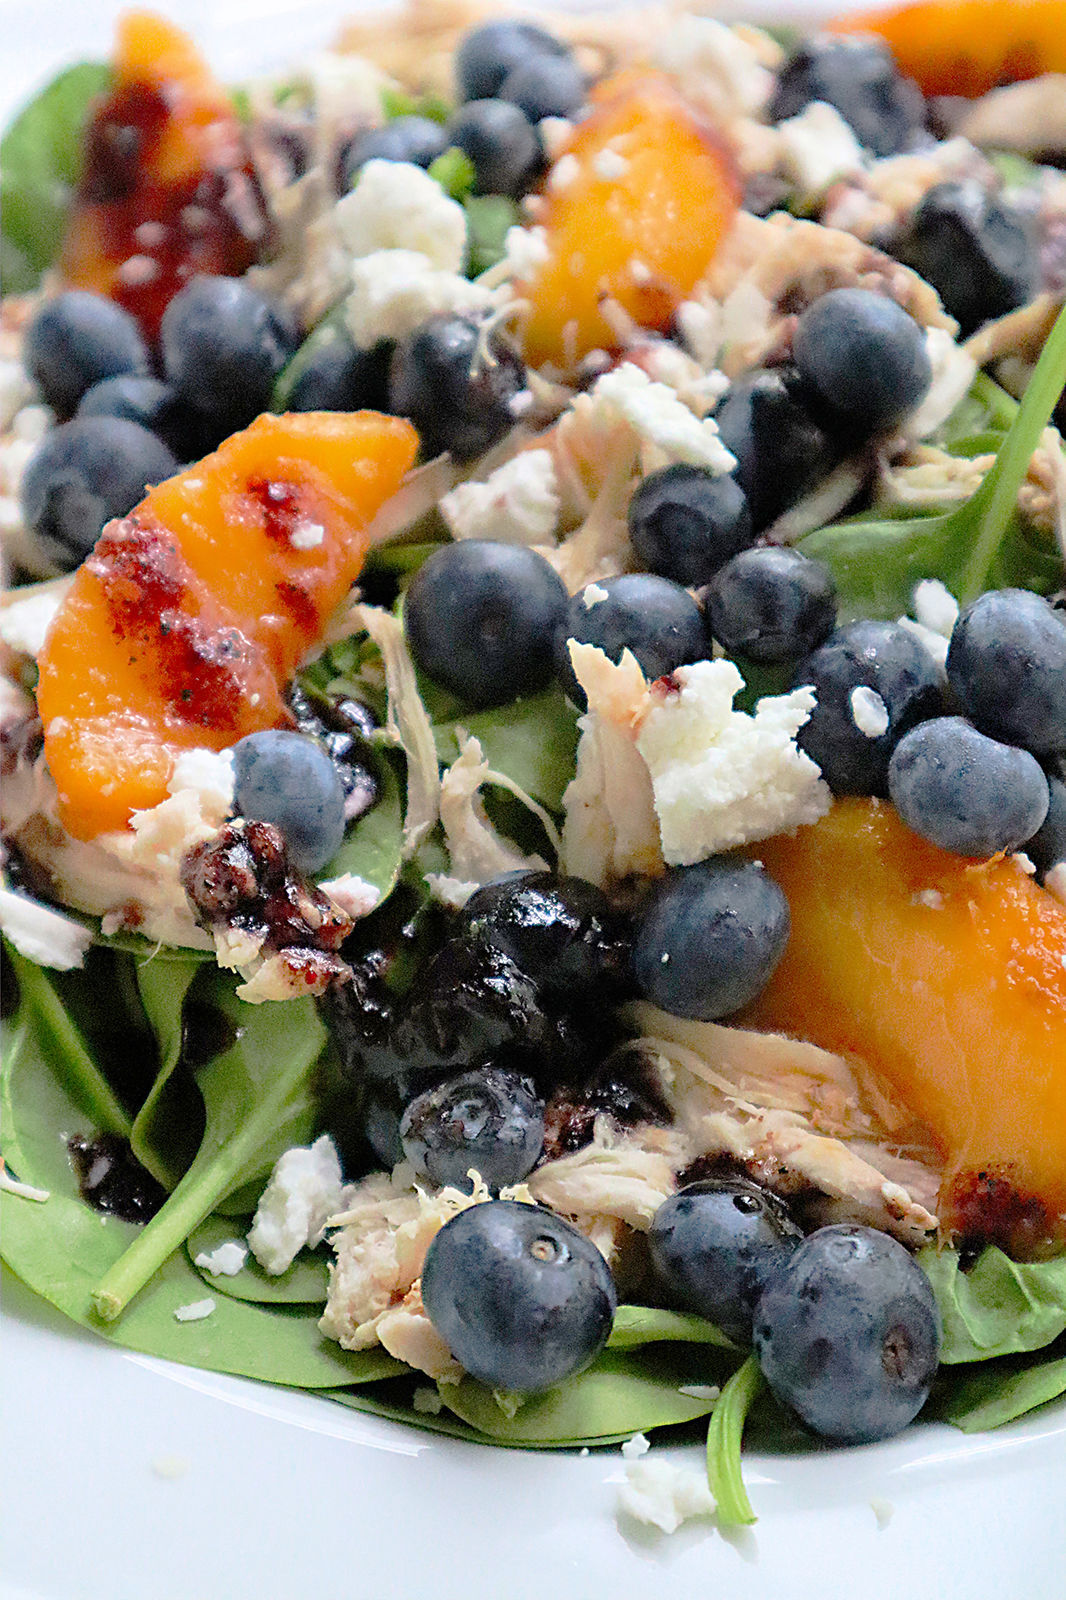 FOOD-BLUEBERRIES-RECIPES-3-PG